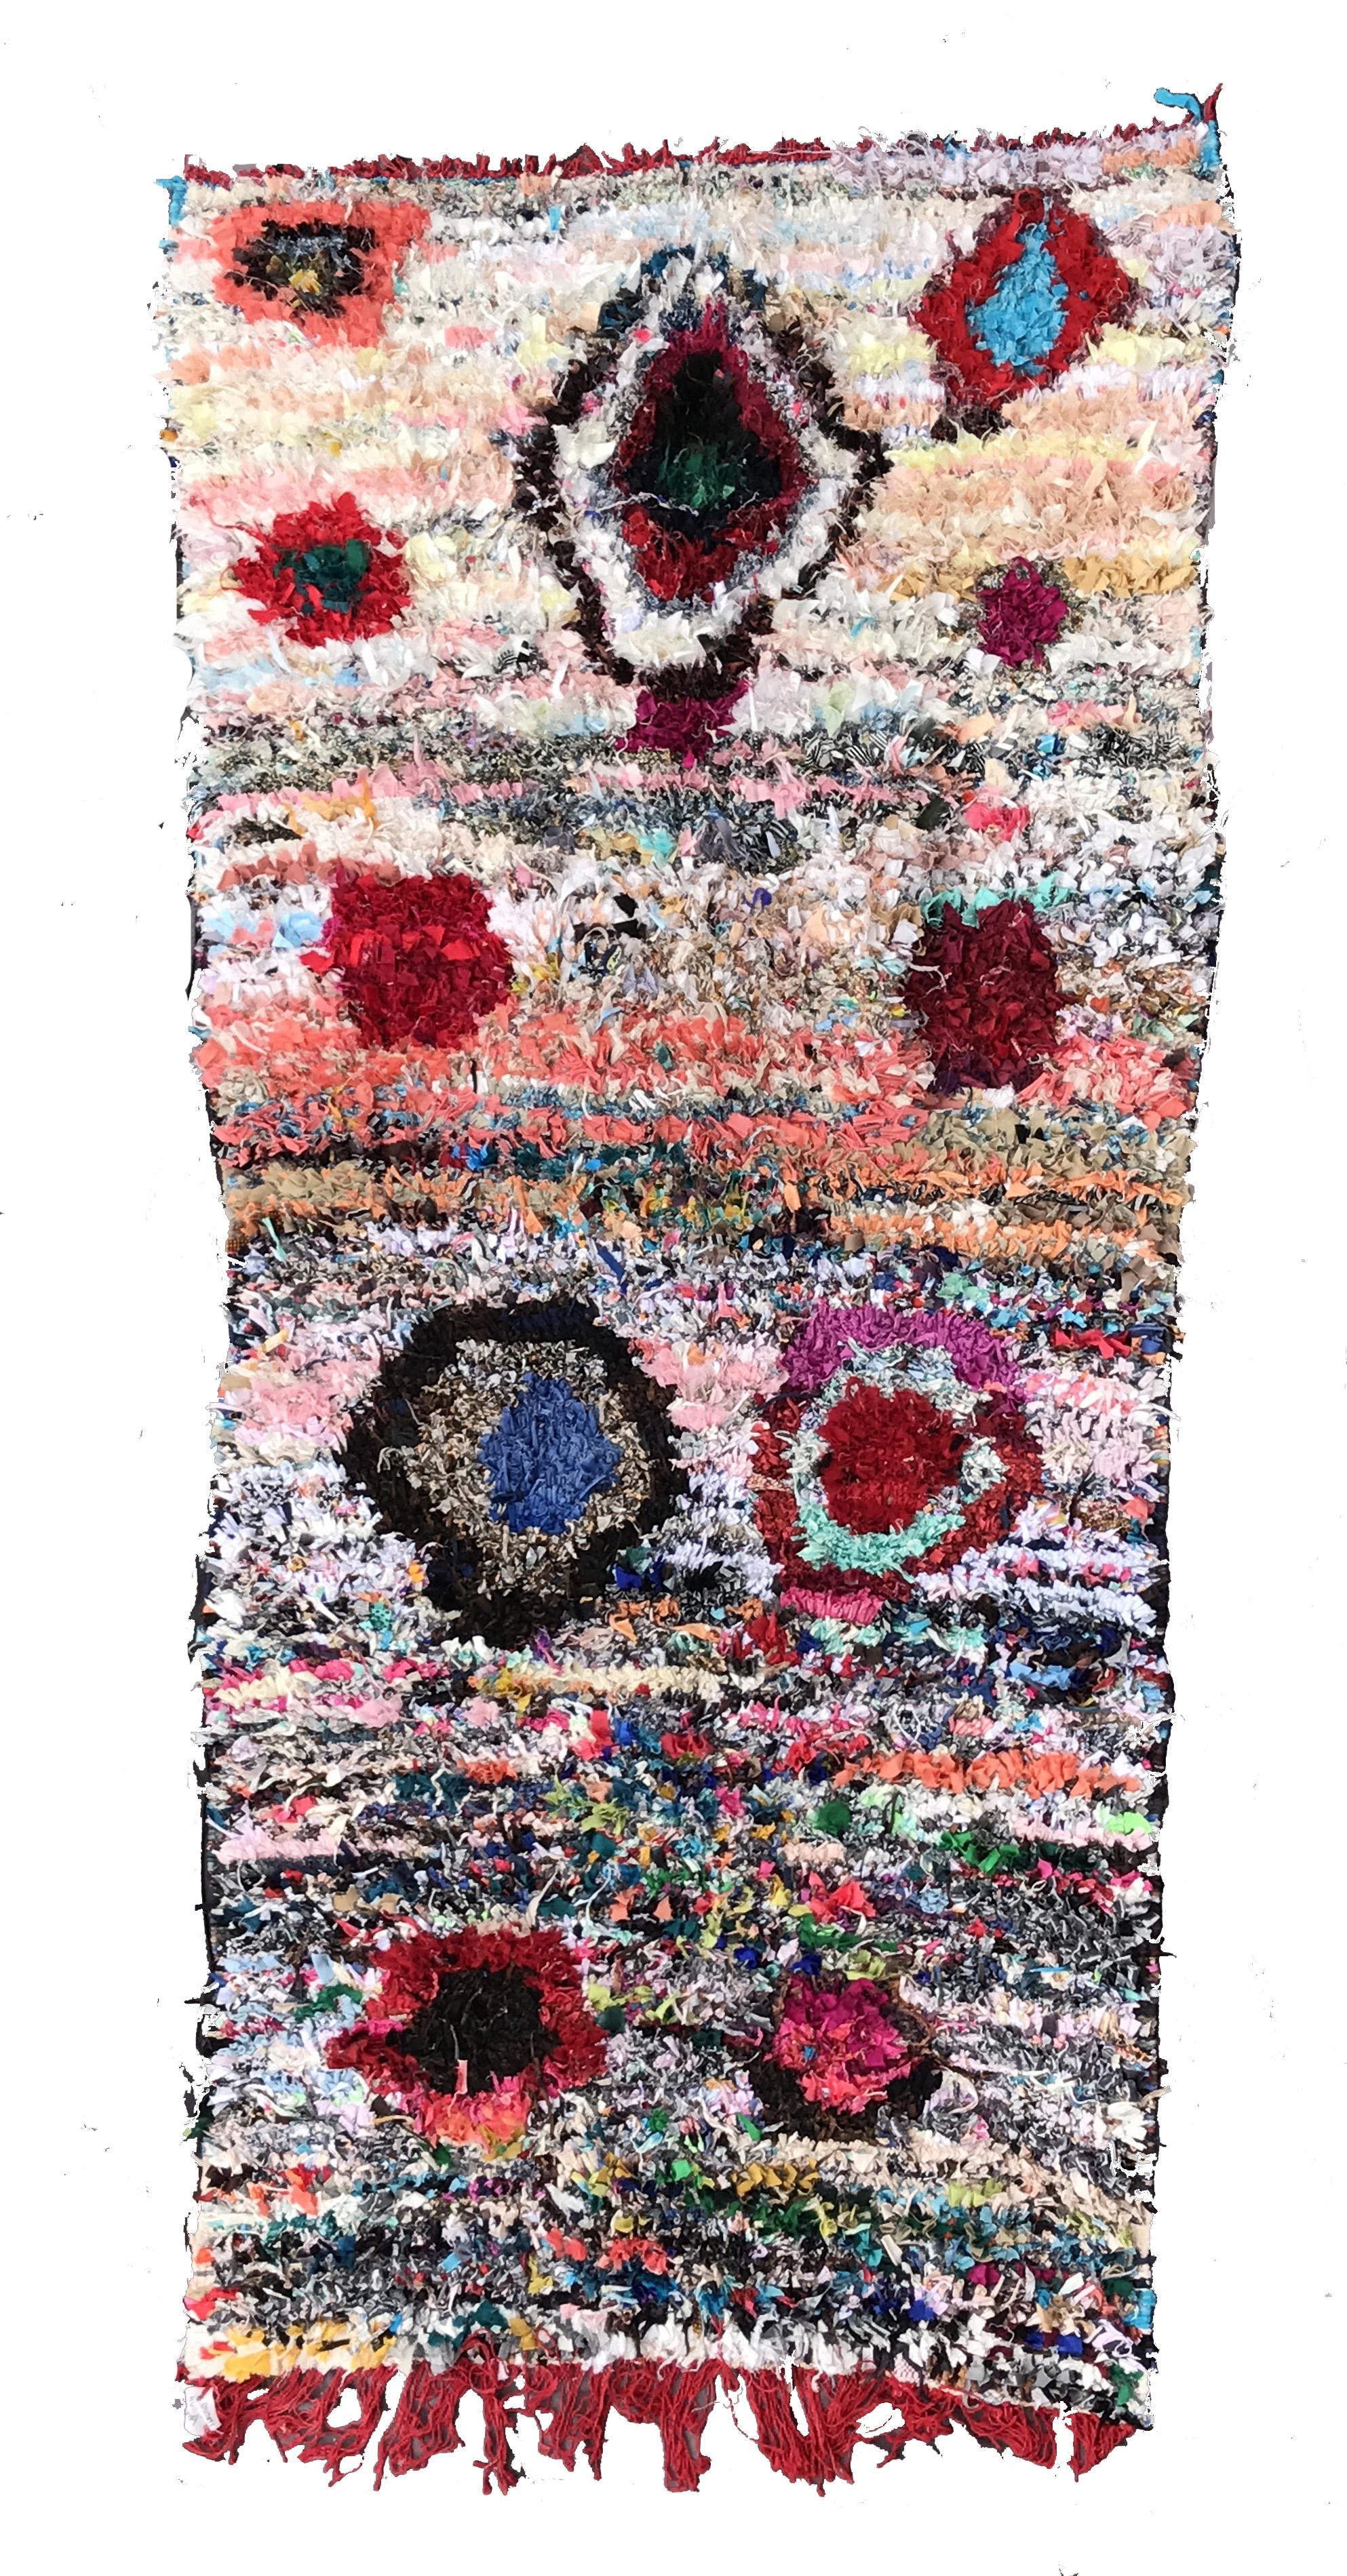 Affordably Hang A Handmade Rug As Art